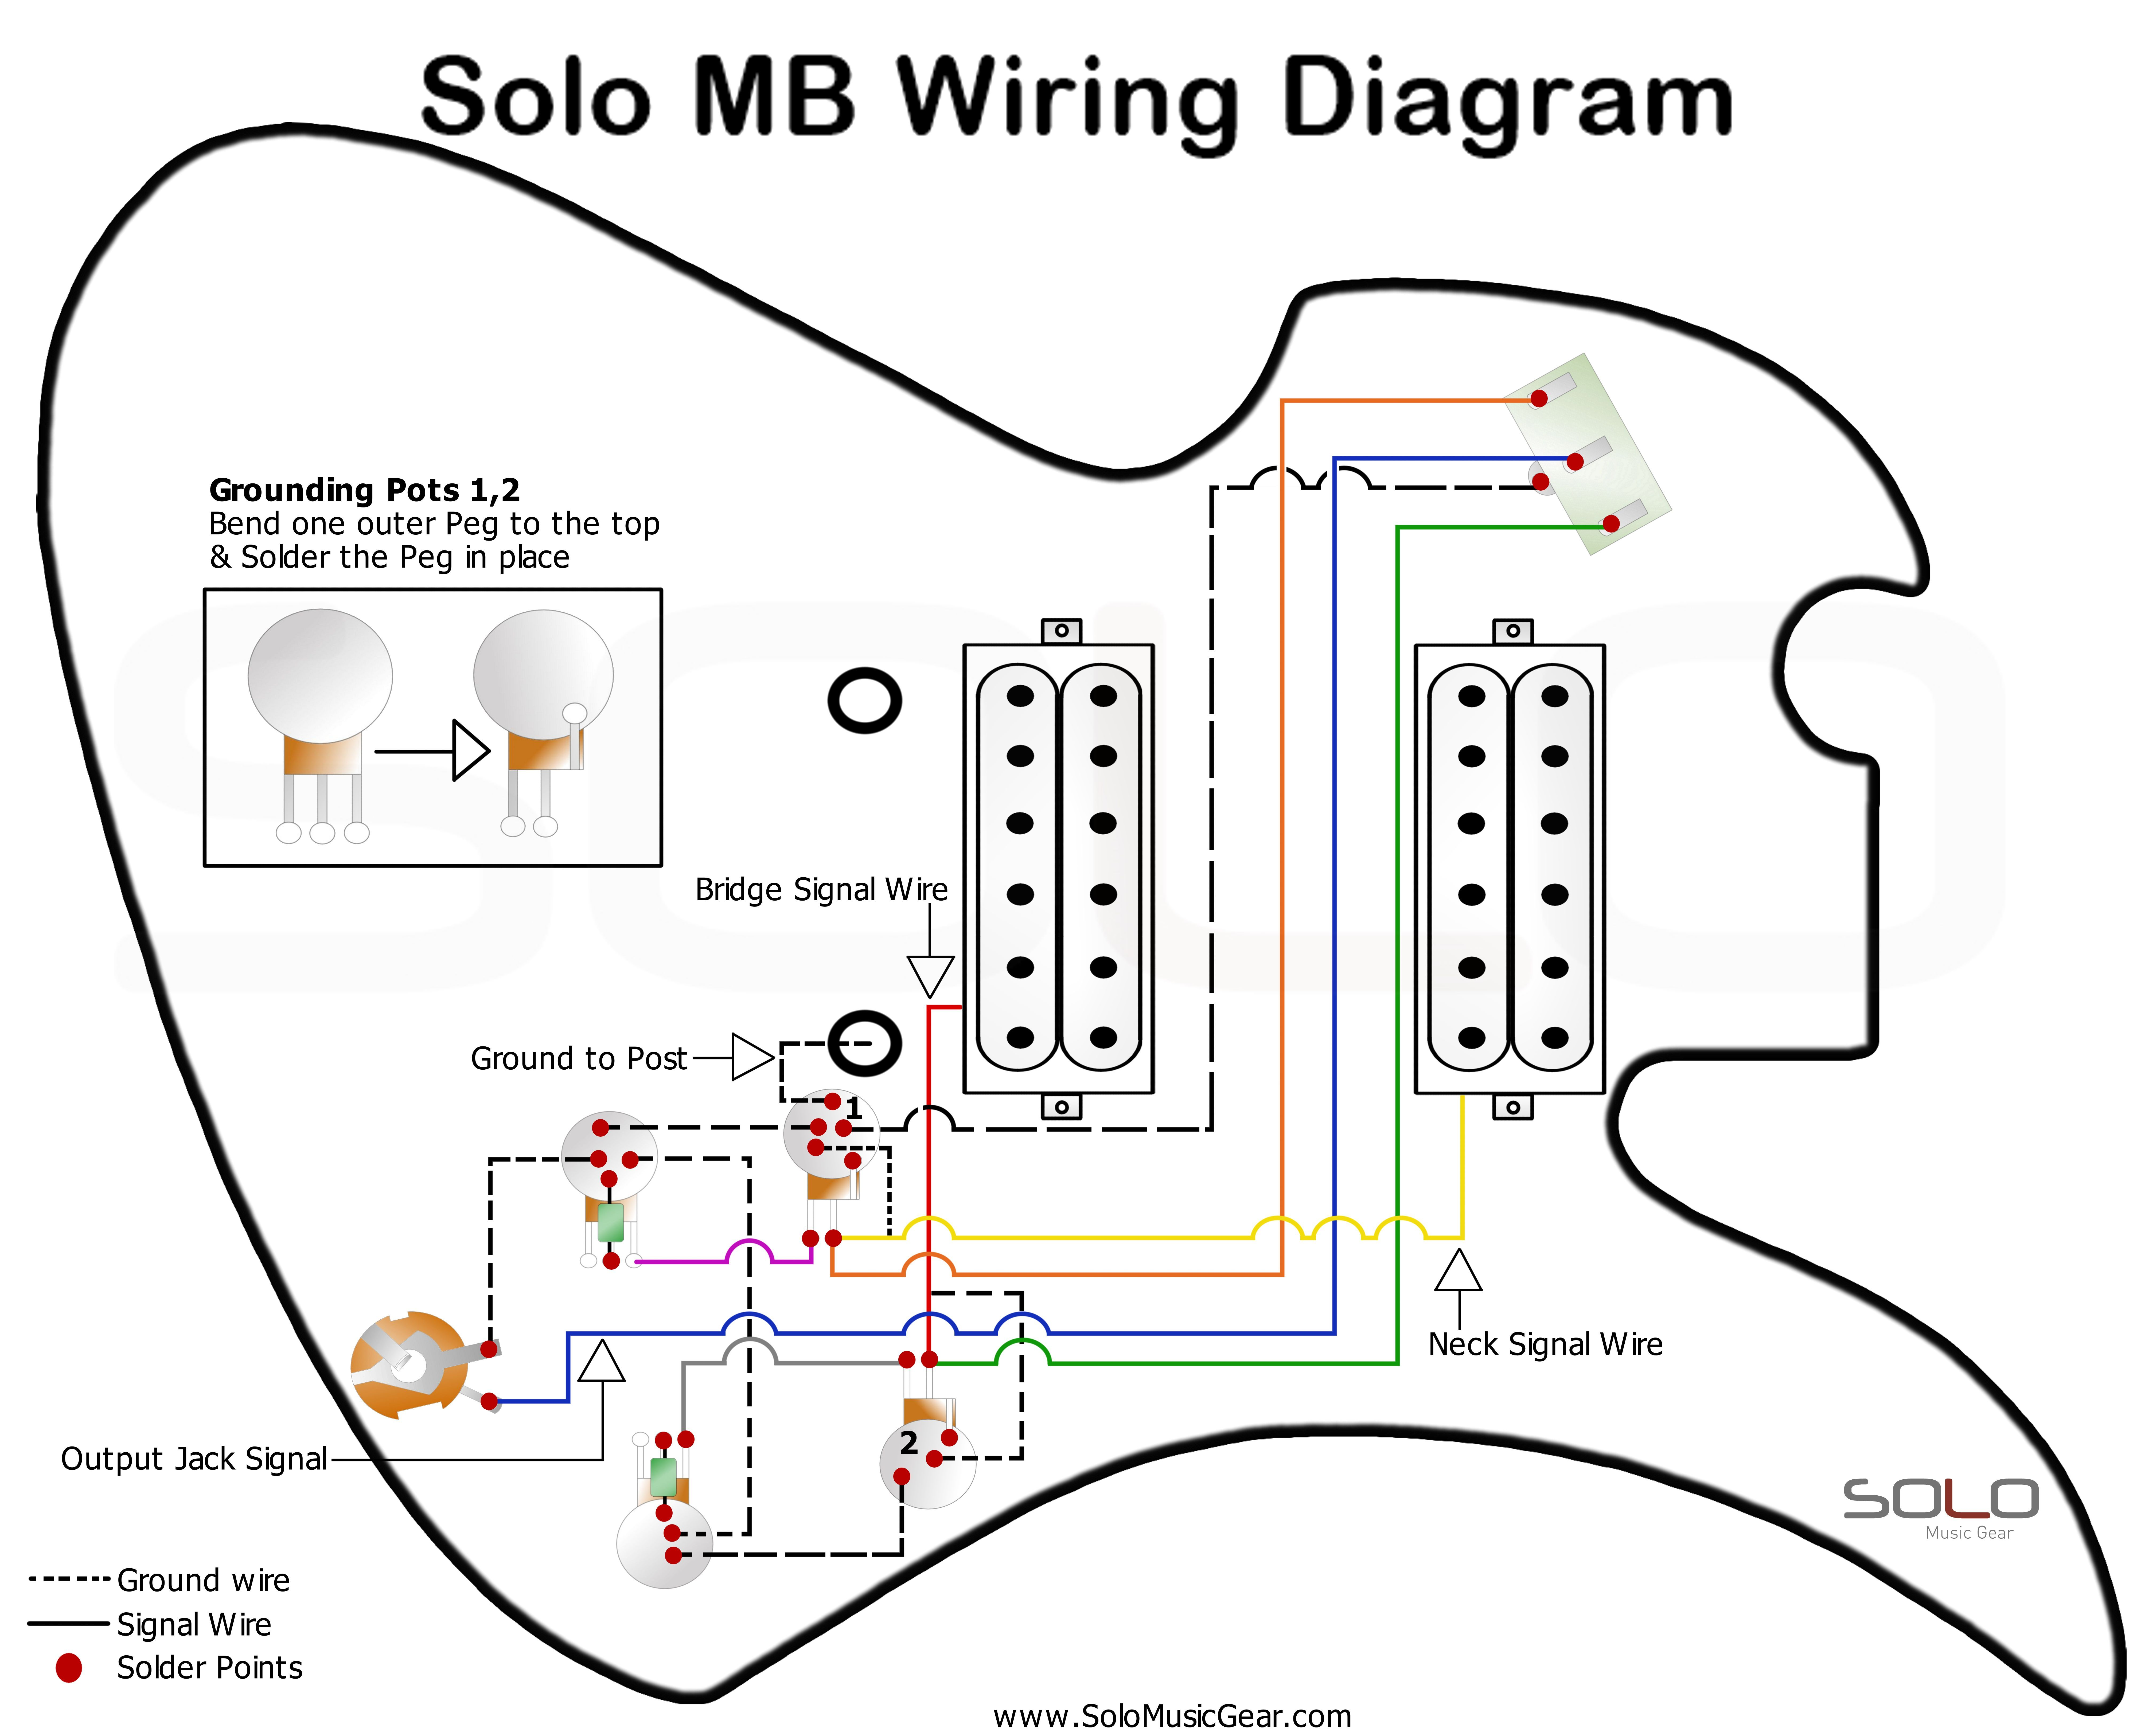 Solo Sg Wiring Diagram Electrical Work Sl 3000 Ul Guitar Kit Free Download Xwiaw Rh Us 1960a Gibson